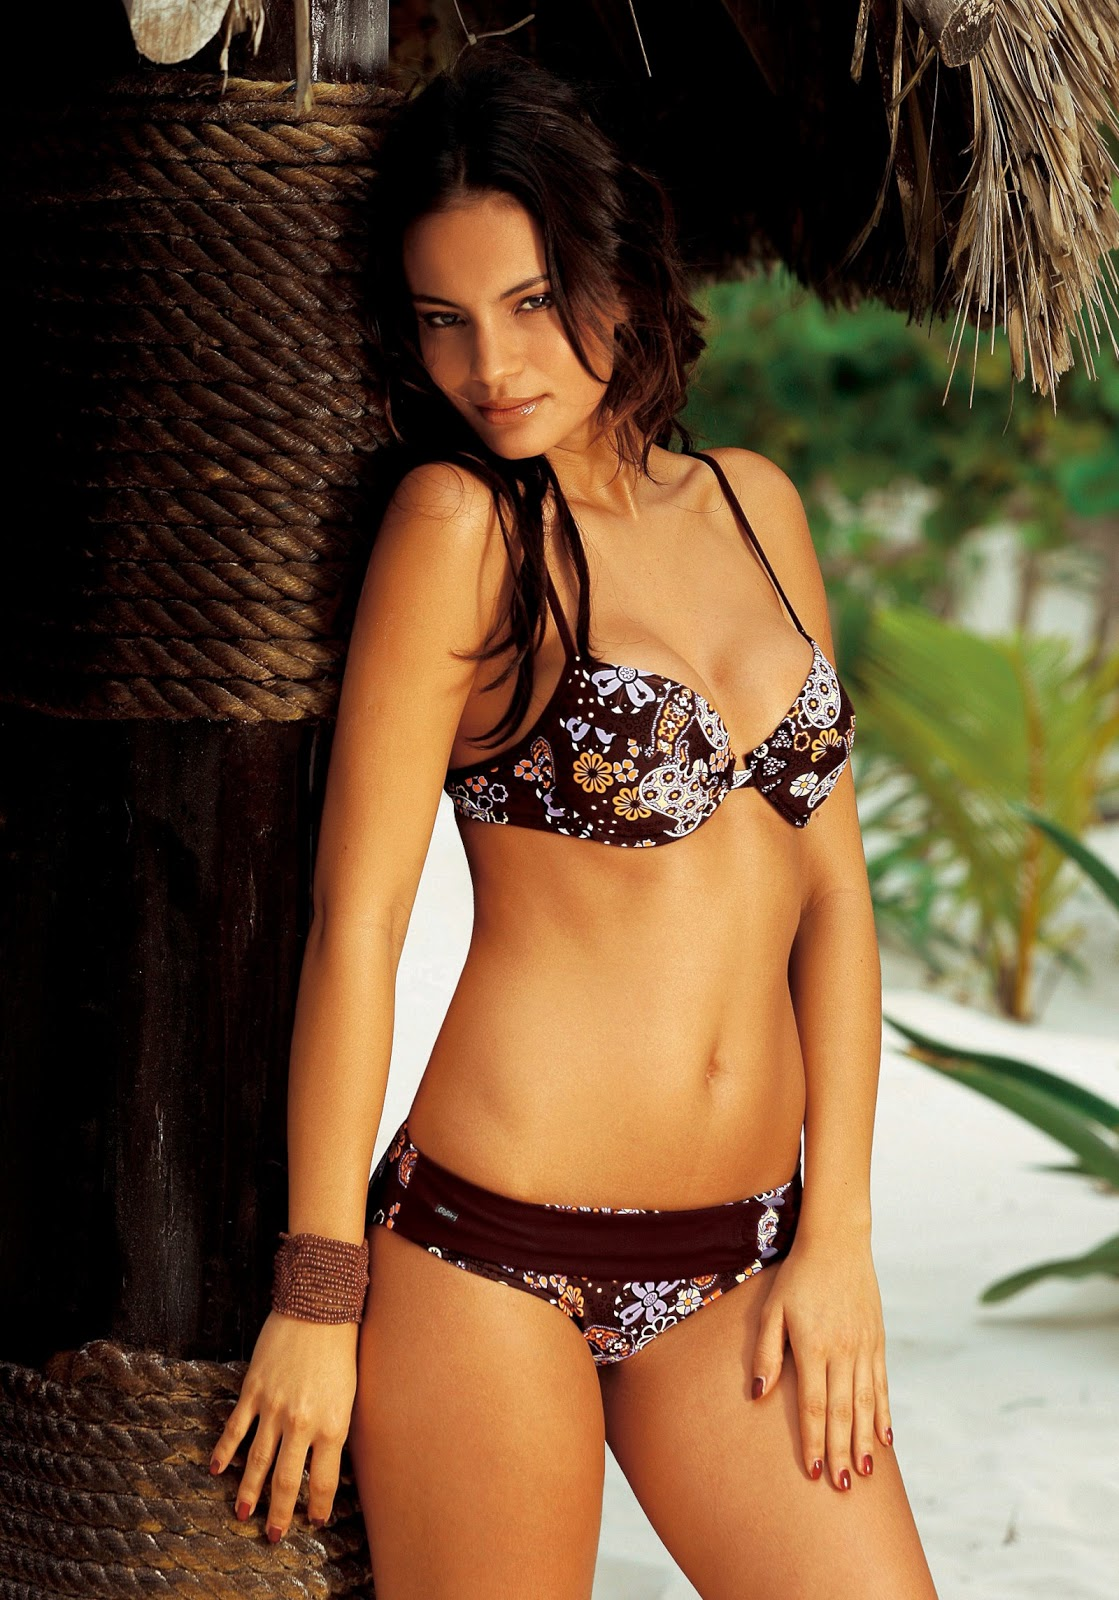 http://4.bp.blogspot.com/-W_UV3u-8LUk/UOKwmKZFXoI/AAAAAAABS40/go2aJ3gv4iM/s1600/Shalana-Santana-hot+(33).jpg